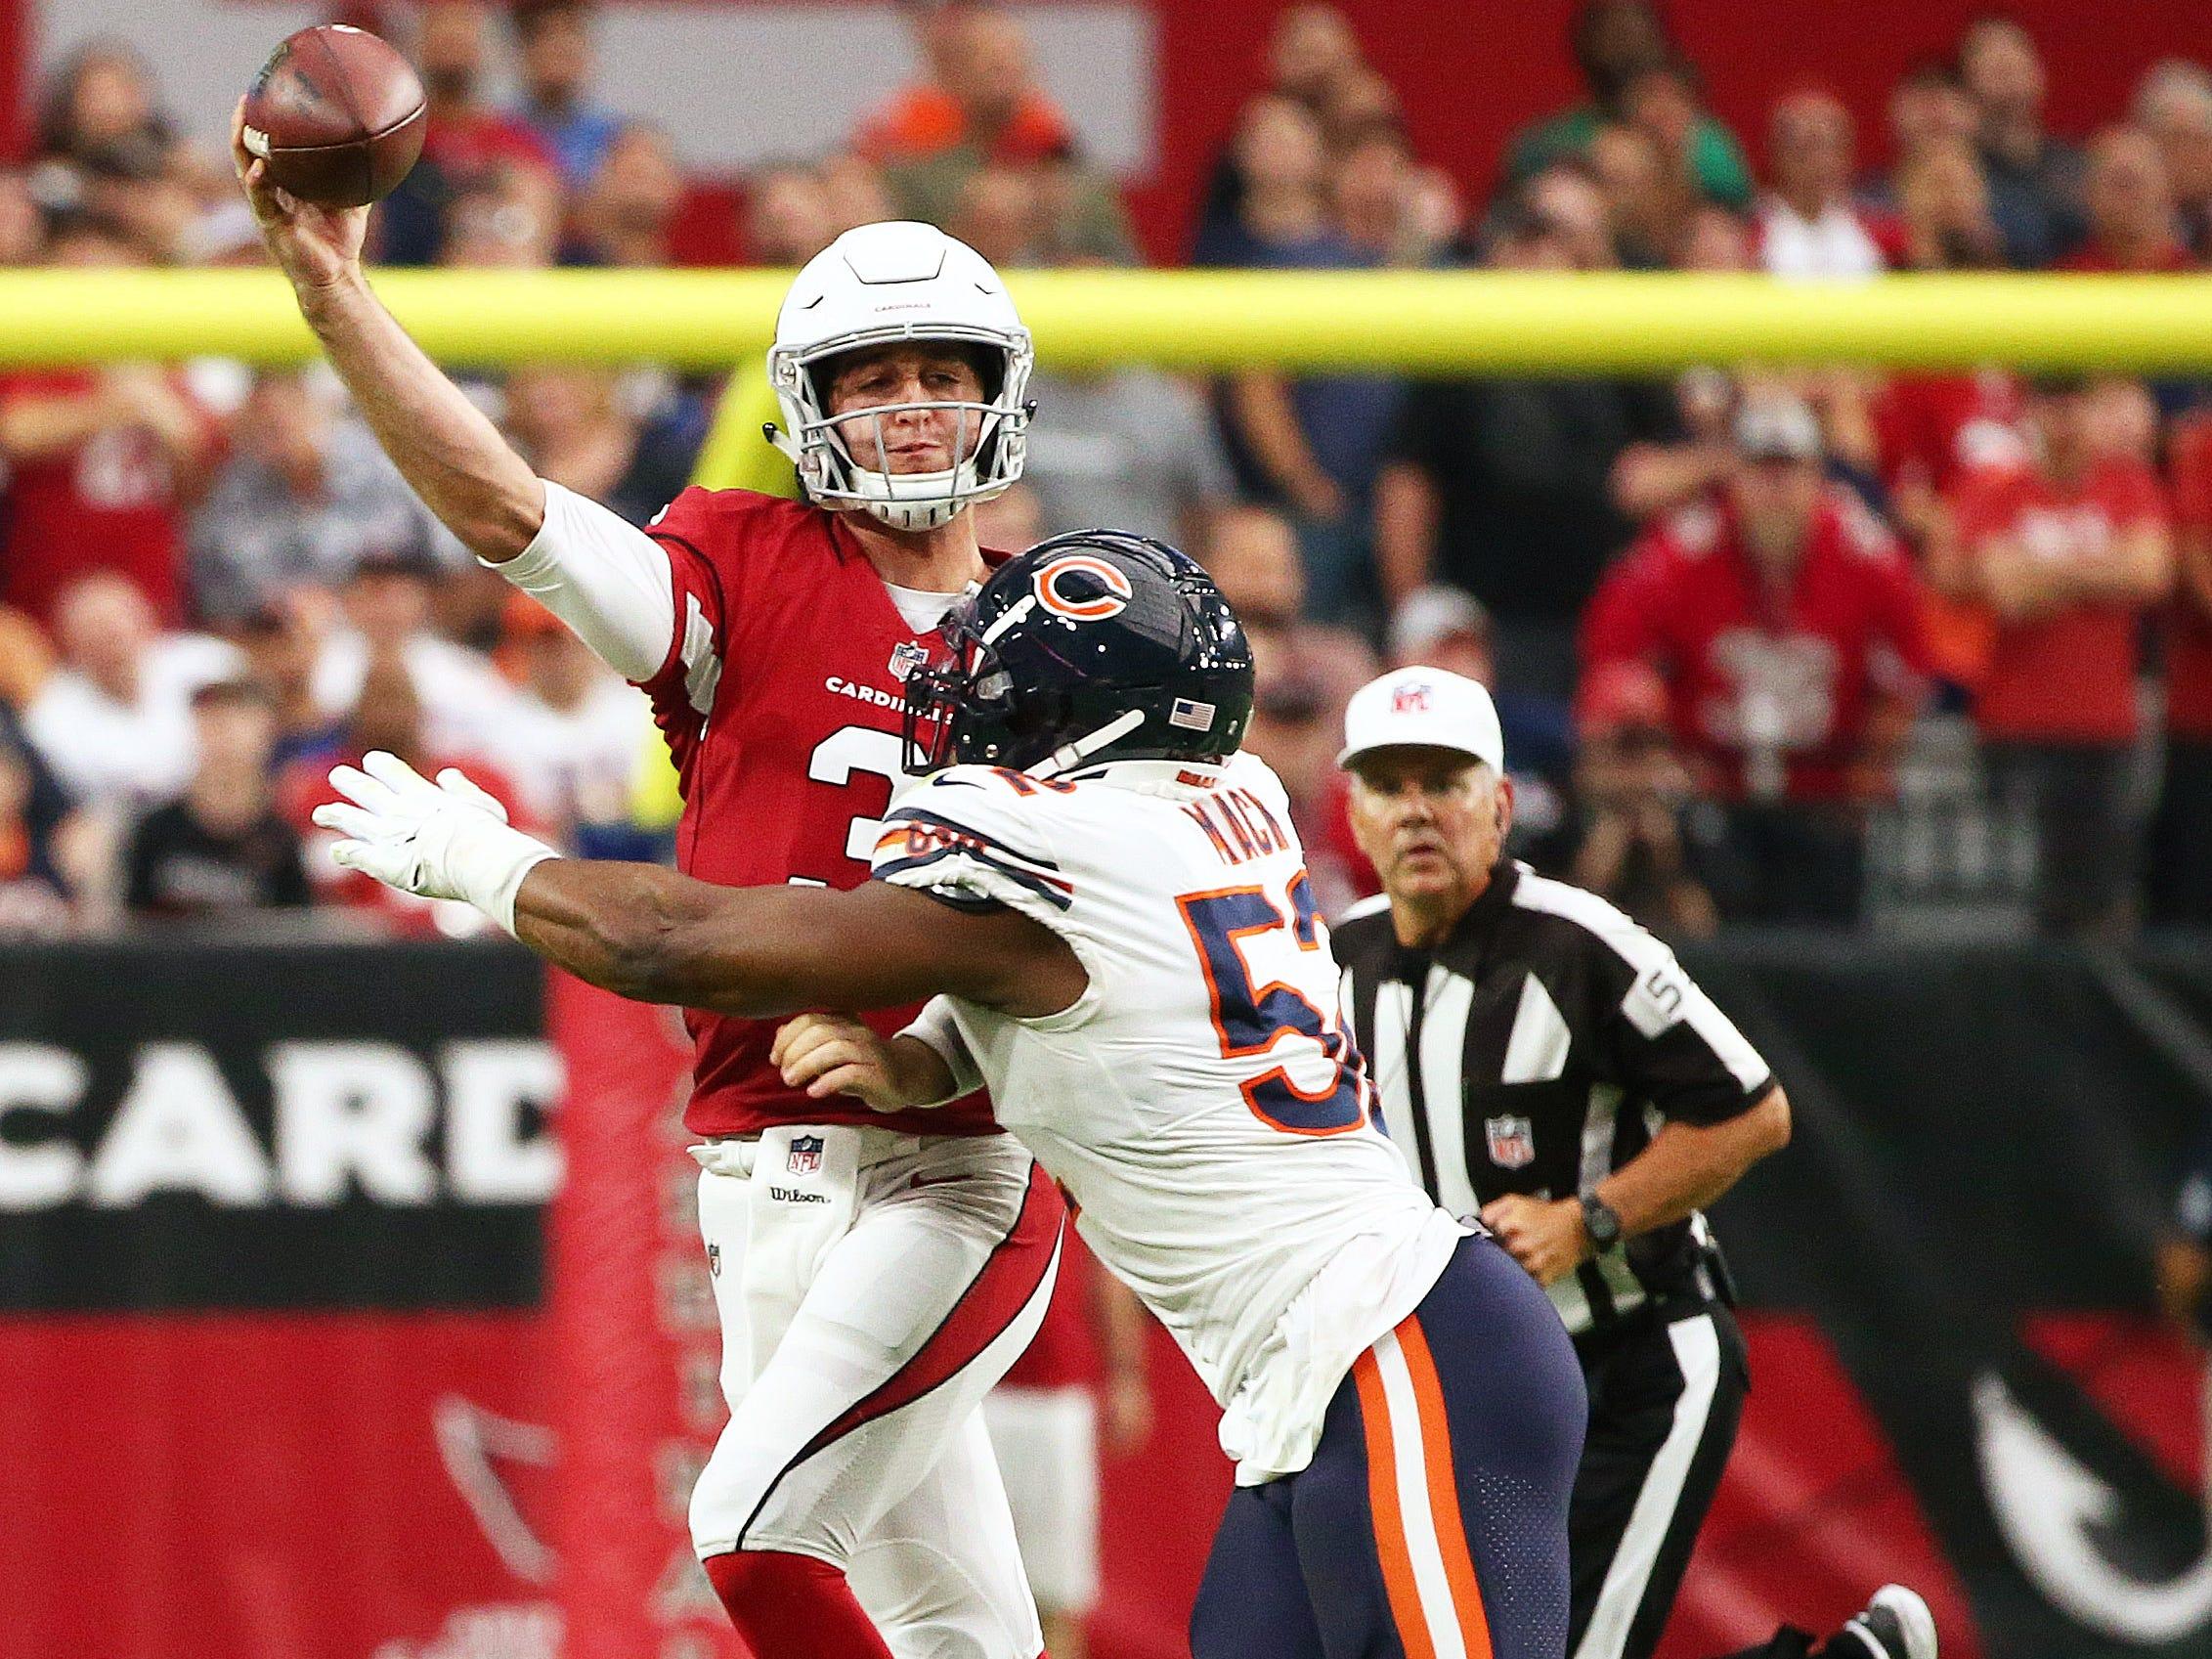 Arizona Cardinals quarterback Josh Rosen is hit by Chicago Bears Khalil Mack at State Farm Stadium in Glendale, Ariz.